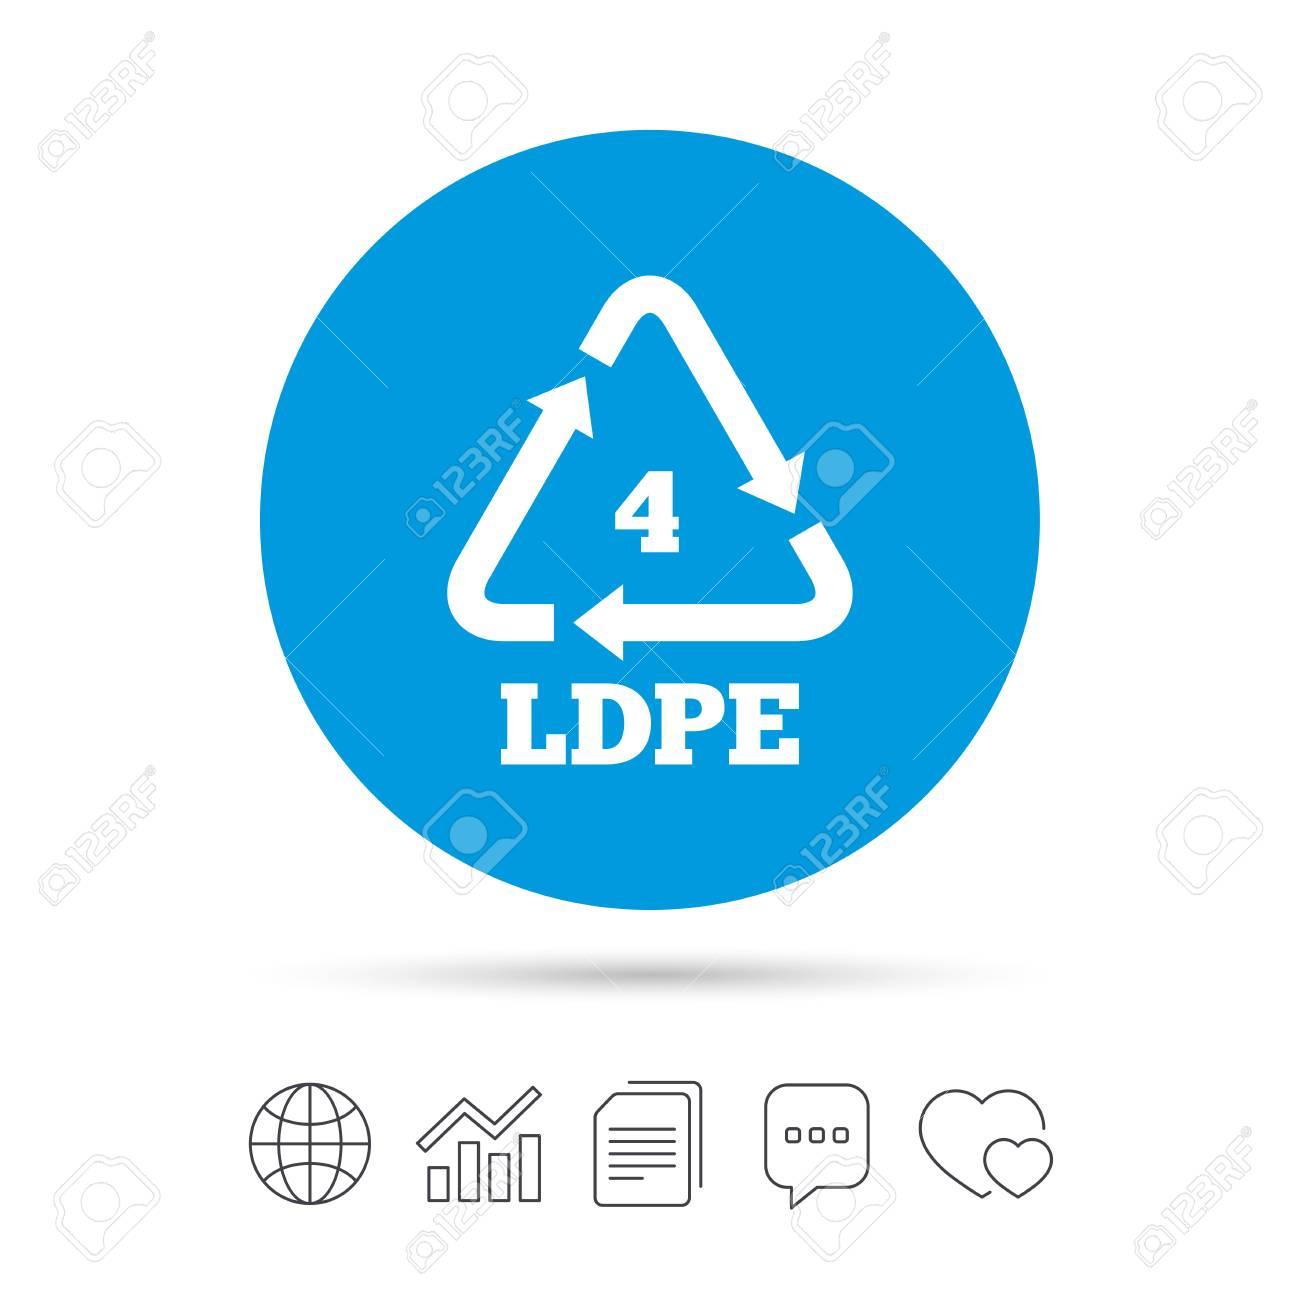 Ld pe 4 icon low density polyethylene sign recycling symbol ld pe 4 icon low density polyethylene sign recycling symbol copy biocorpaavc Choice Image